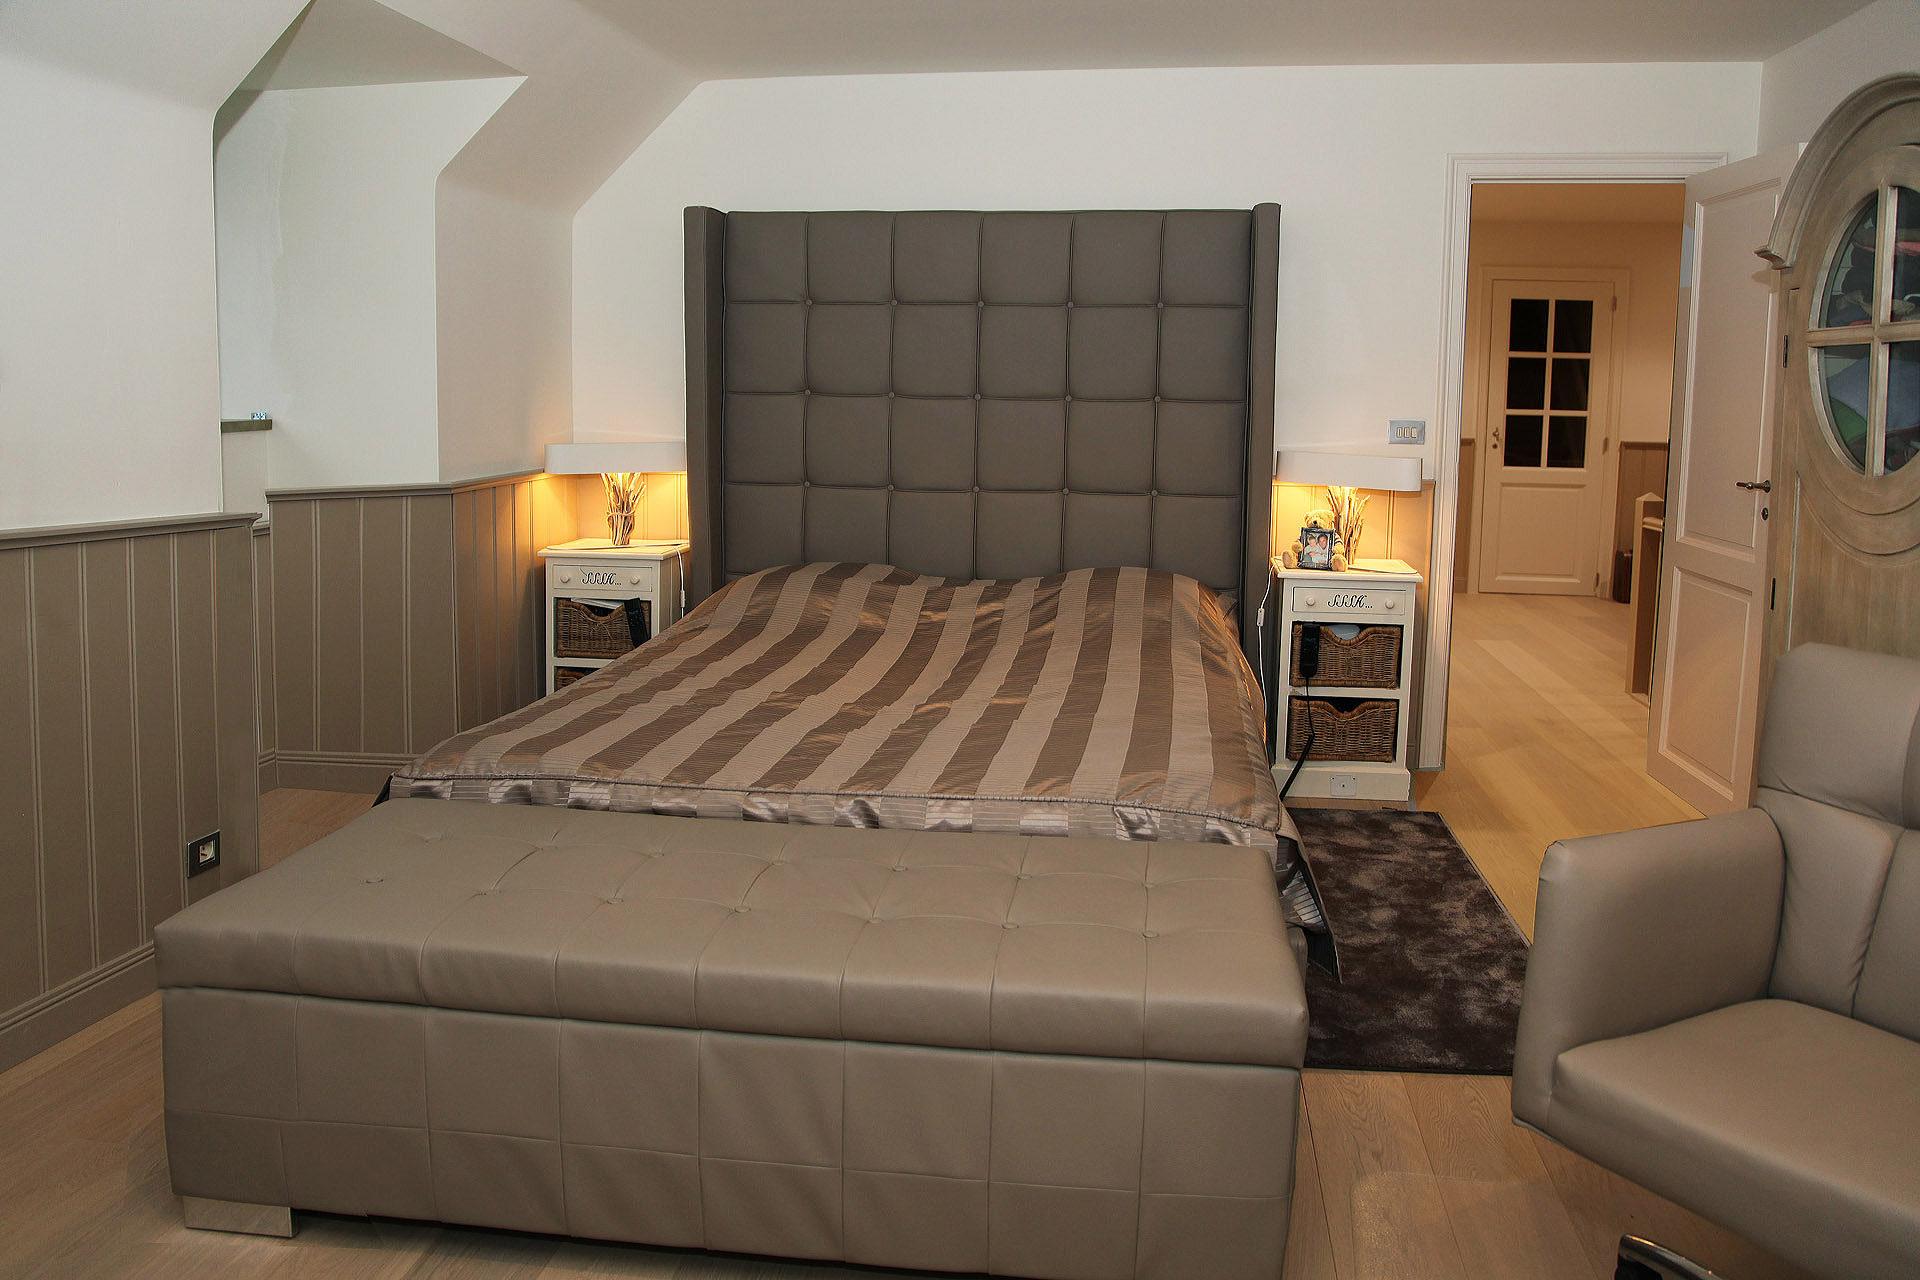 Slaapkamer Landelijk Boxspring : Landelijke slaapkamers marcotte style